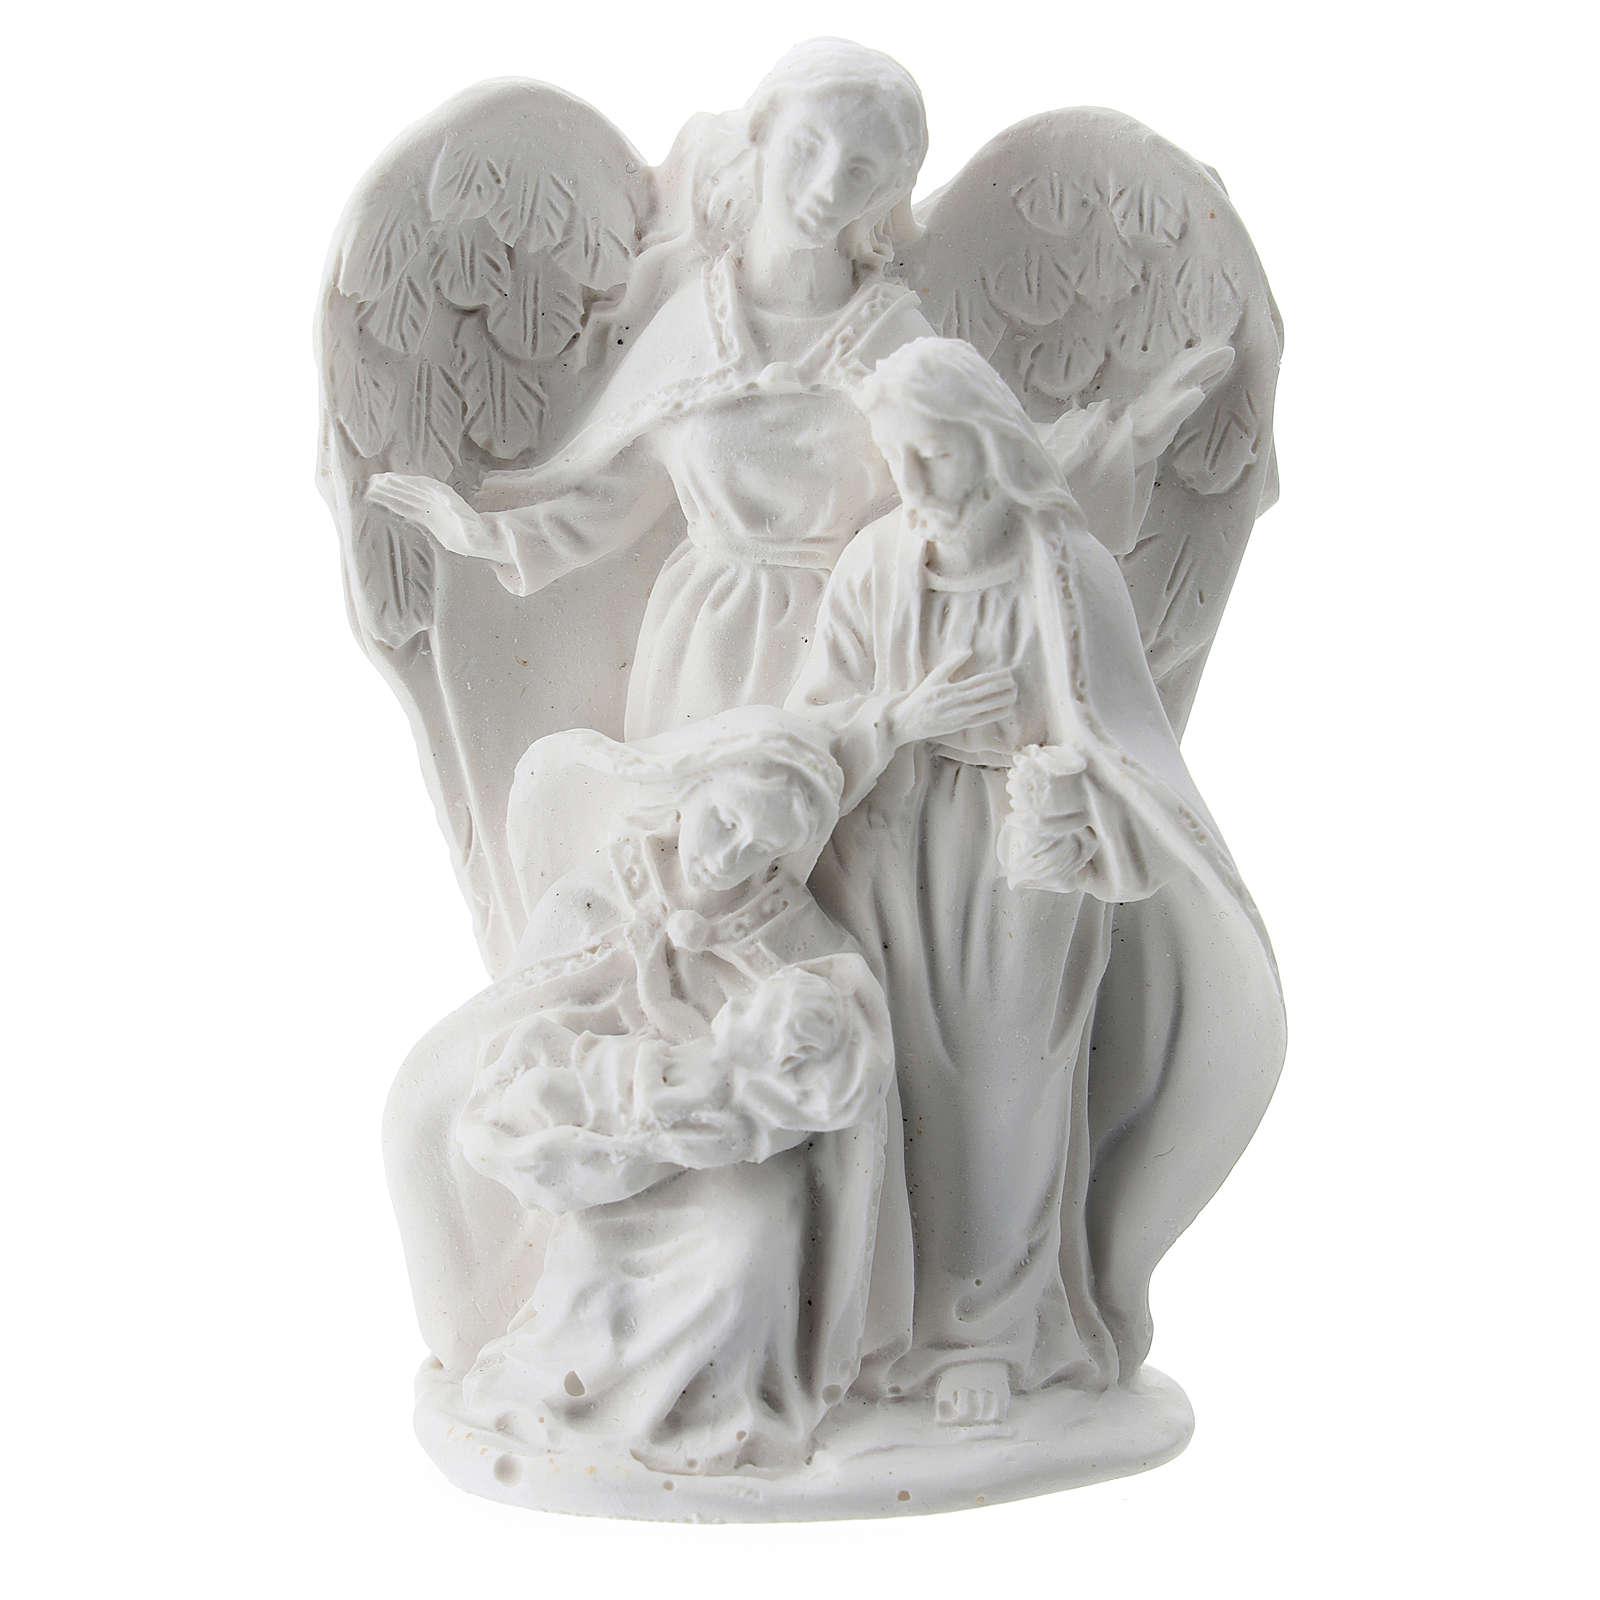 Sagrada Familia resina con Ángel 5 cm 3